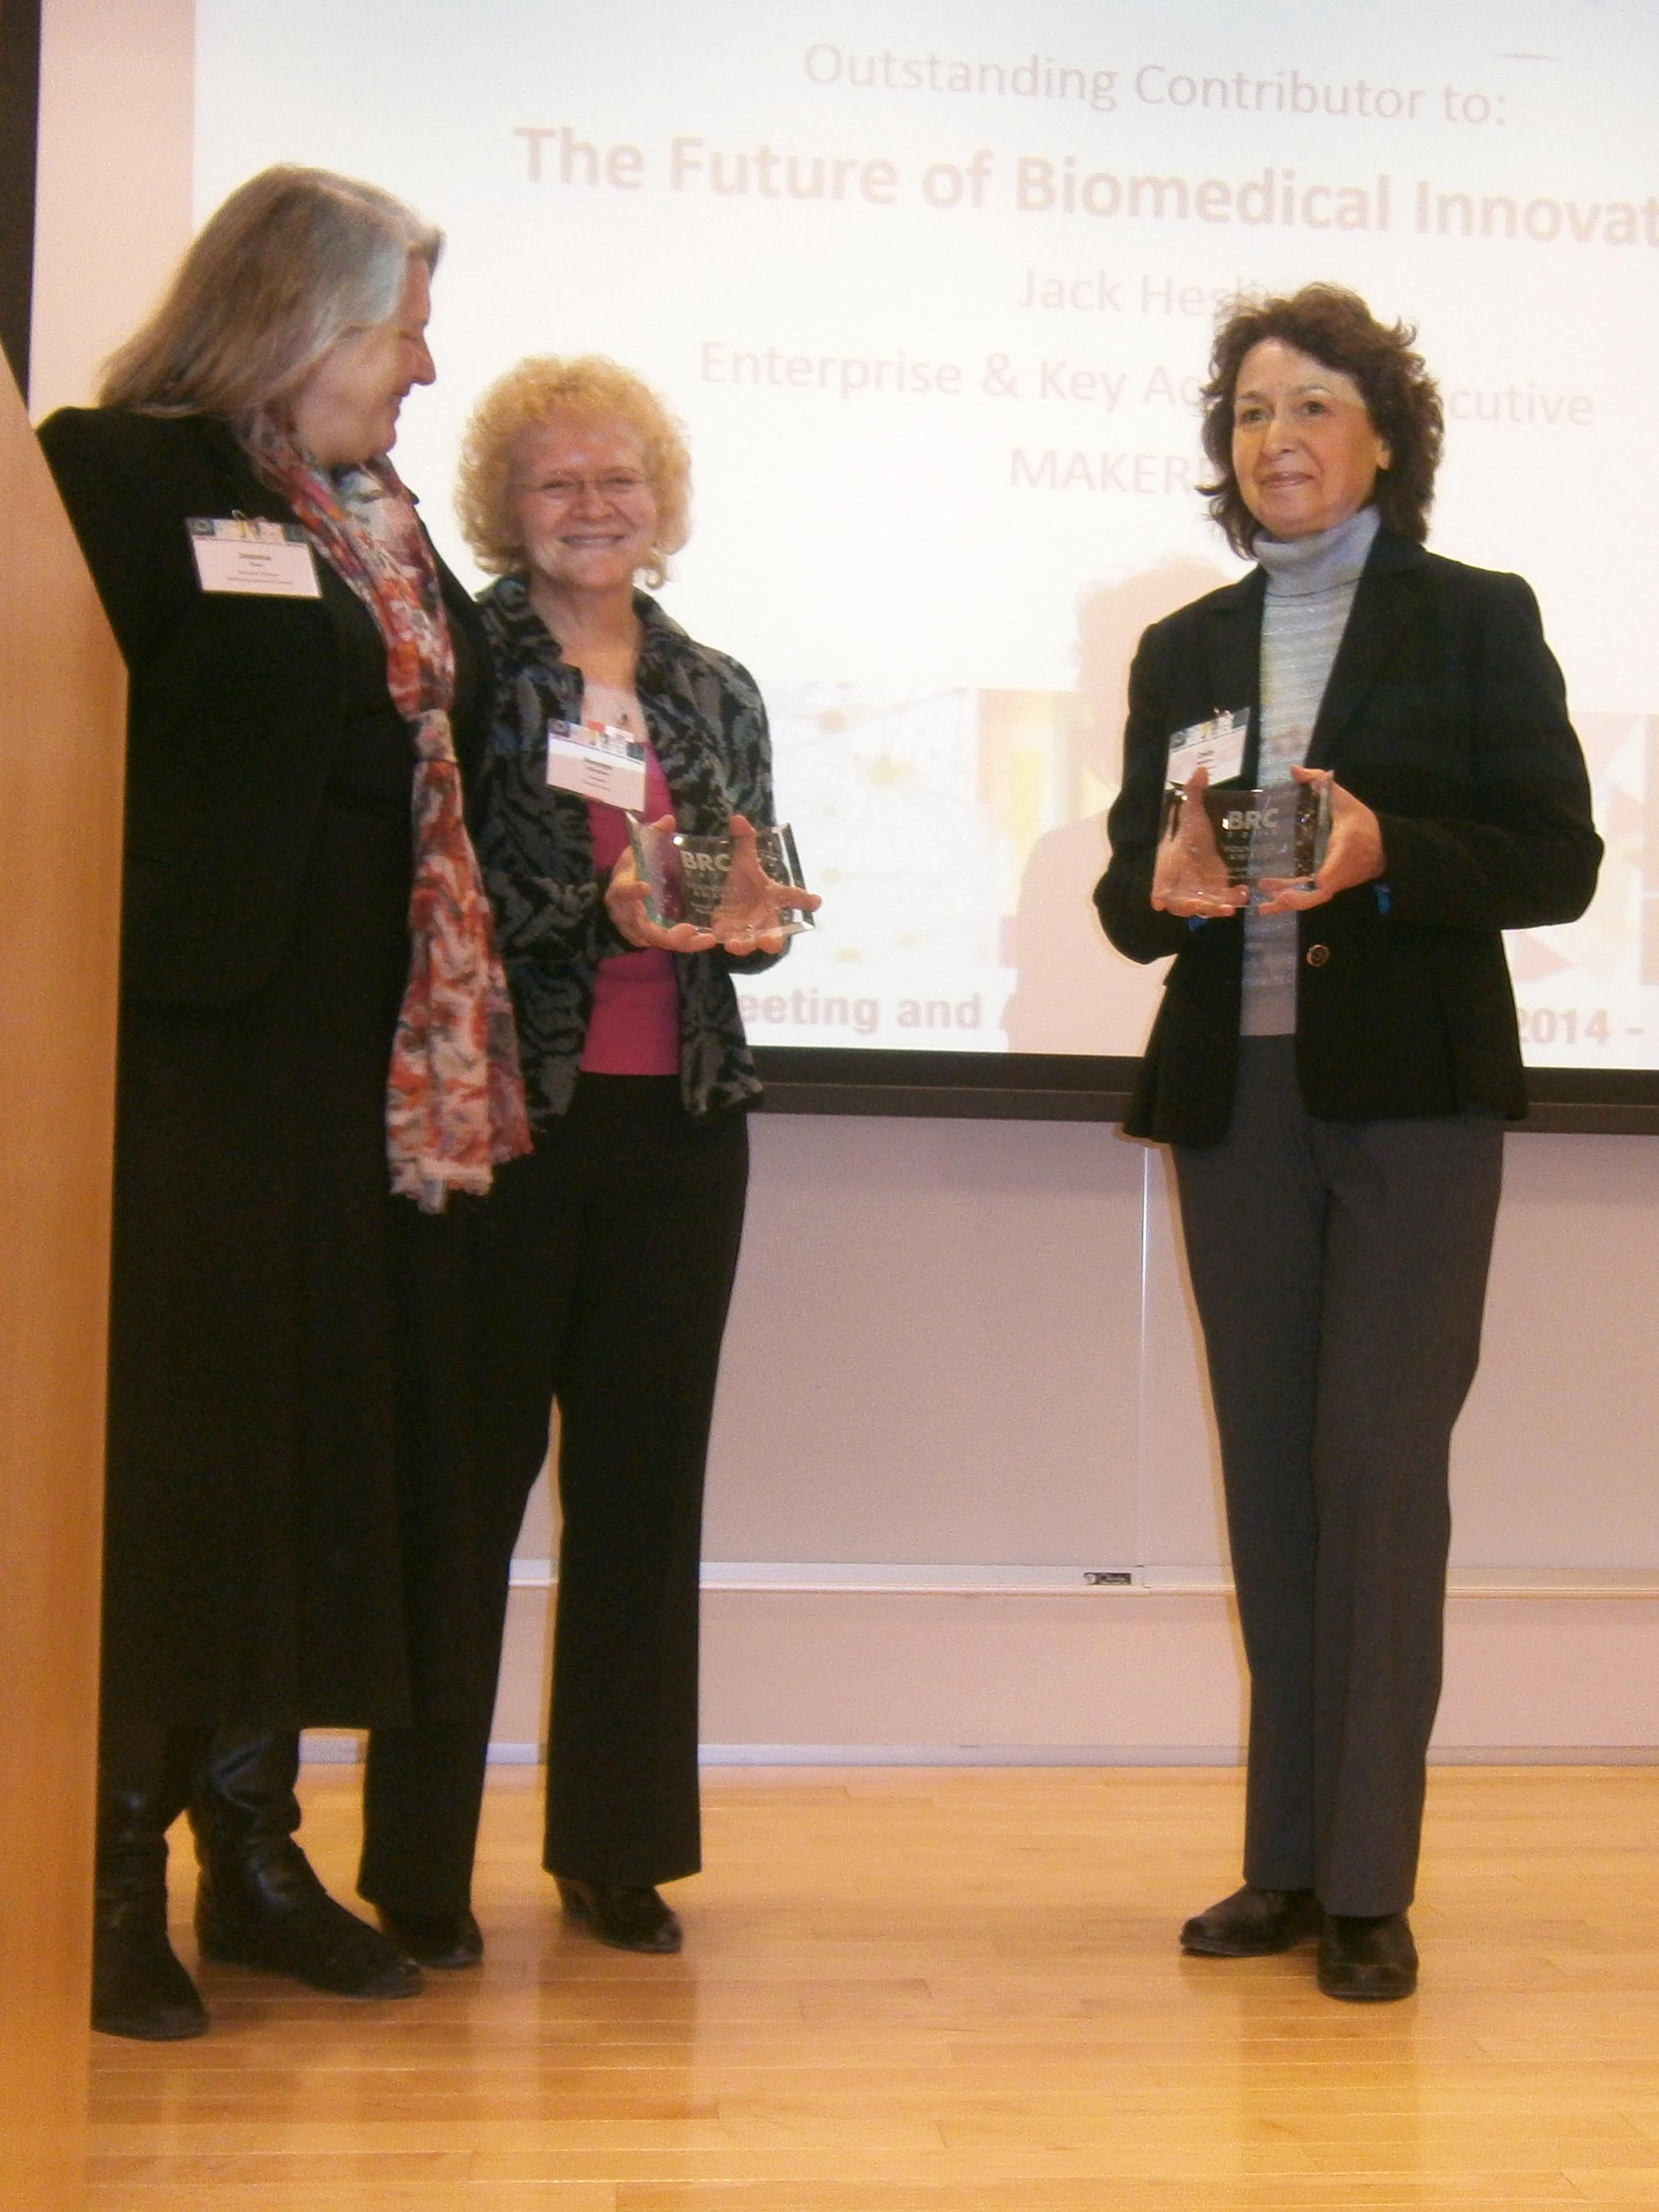 Dr. Dolly Koltchev receiving award.